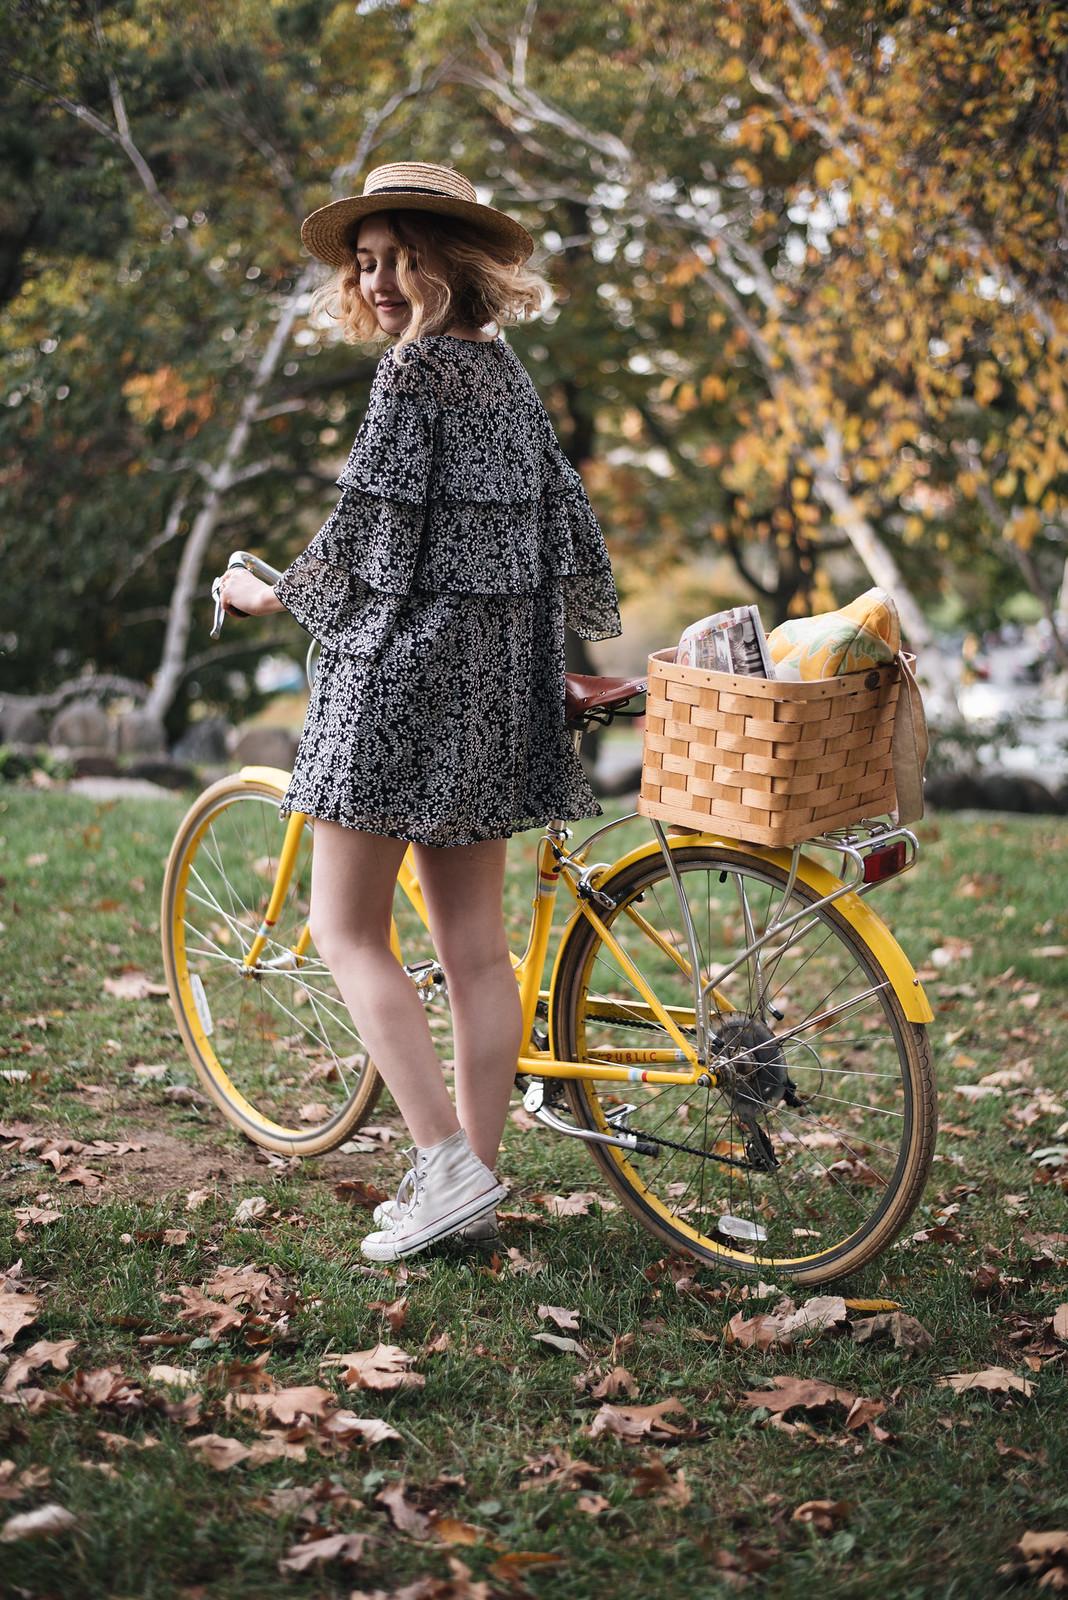 Floral Dress, Straw Hat, Converse, and Yellow Bike on juliettelaura.blogspot.com